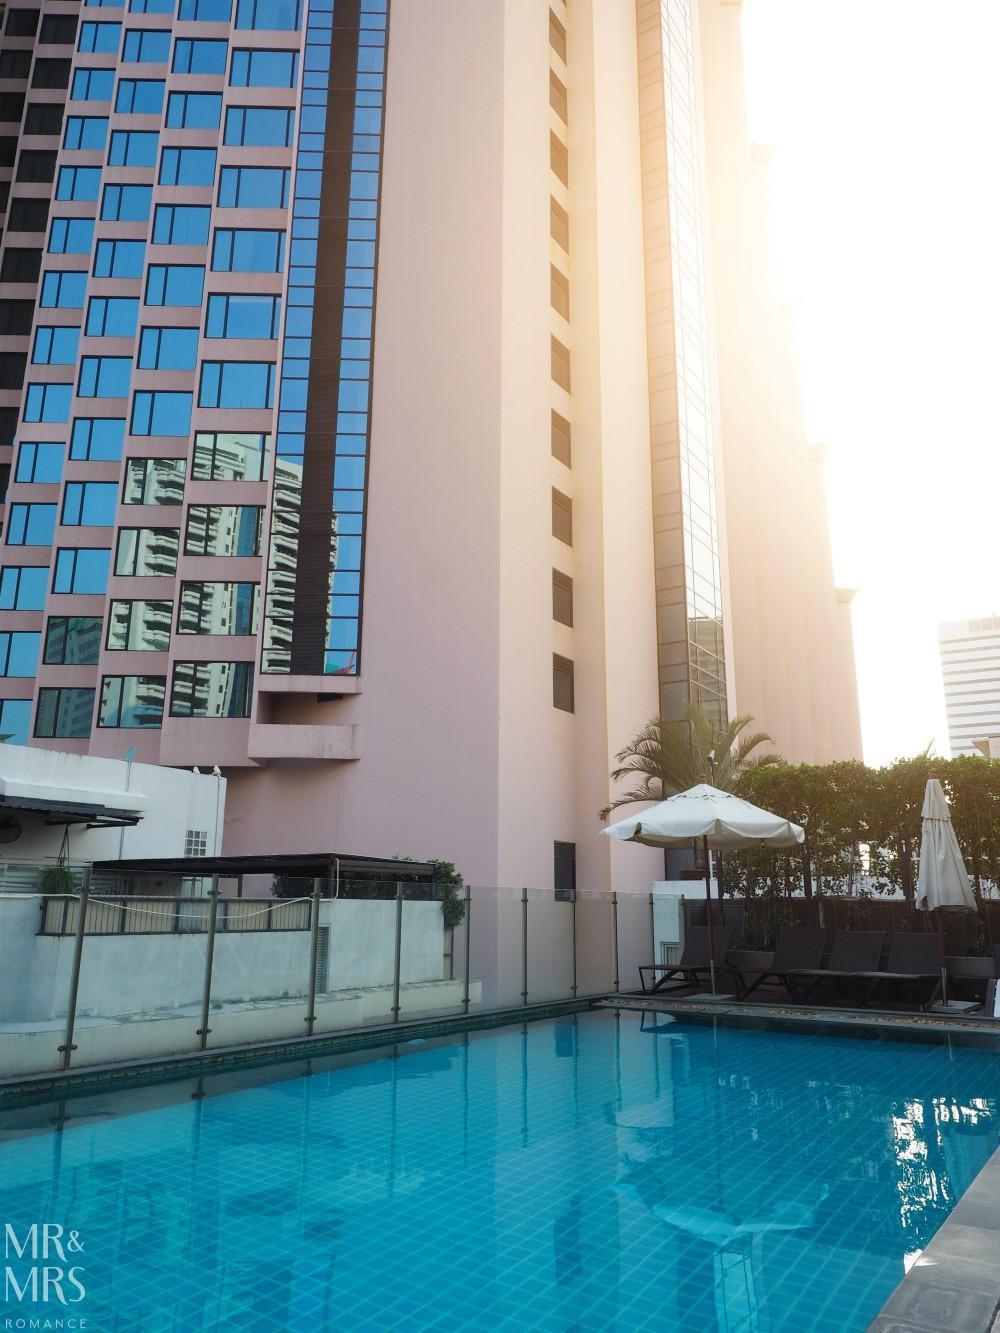 Well Hotel Bangkok, Sukhumvit Soi 20 - rooftop pool